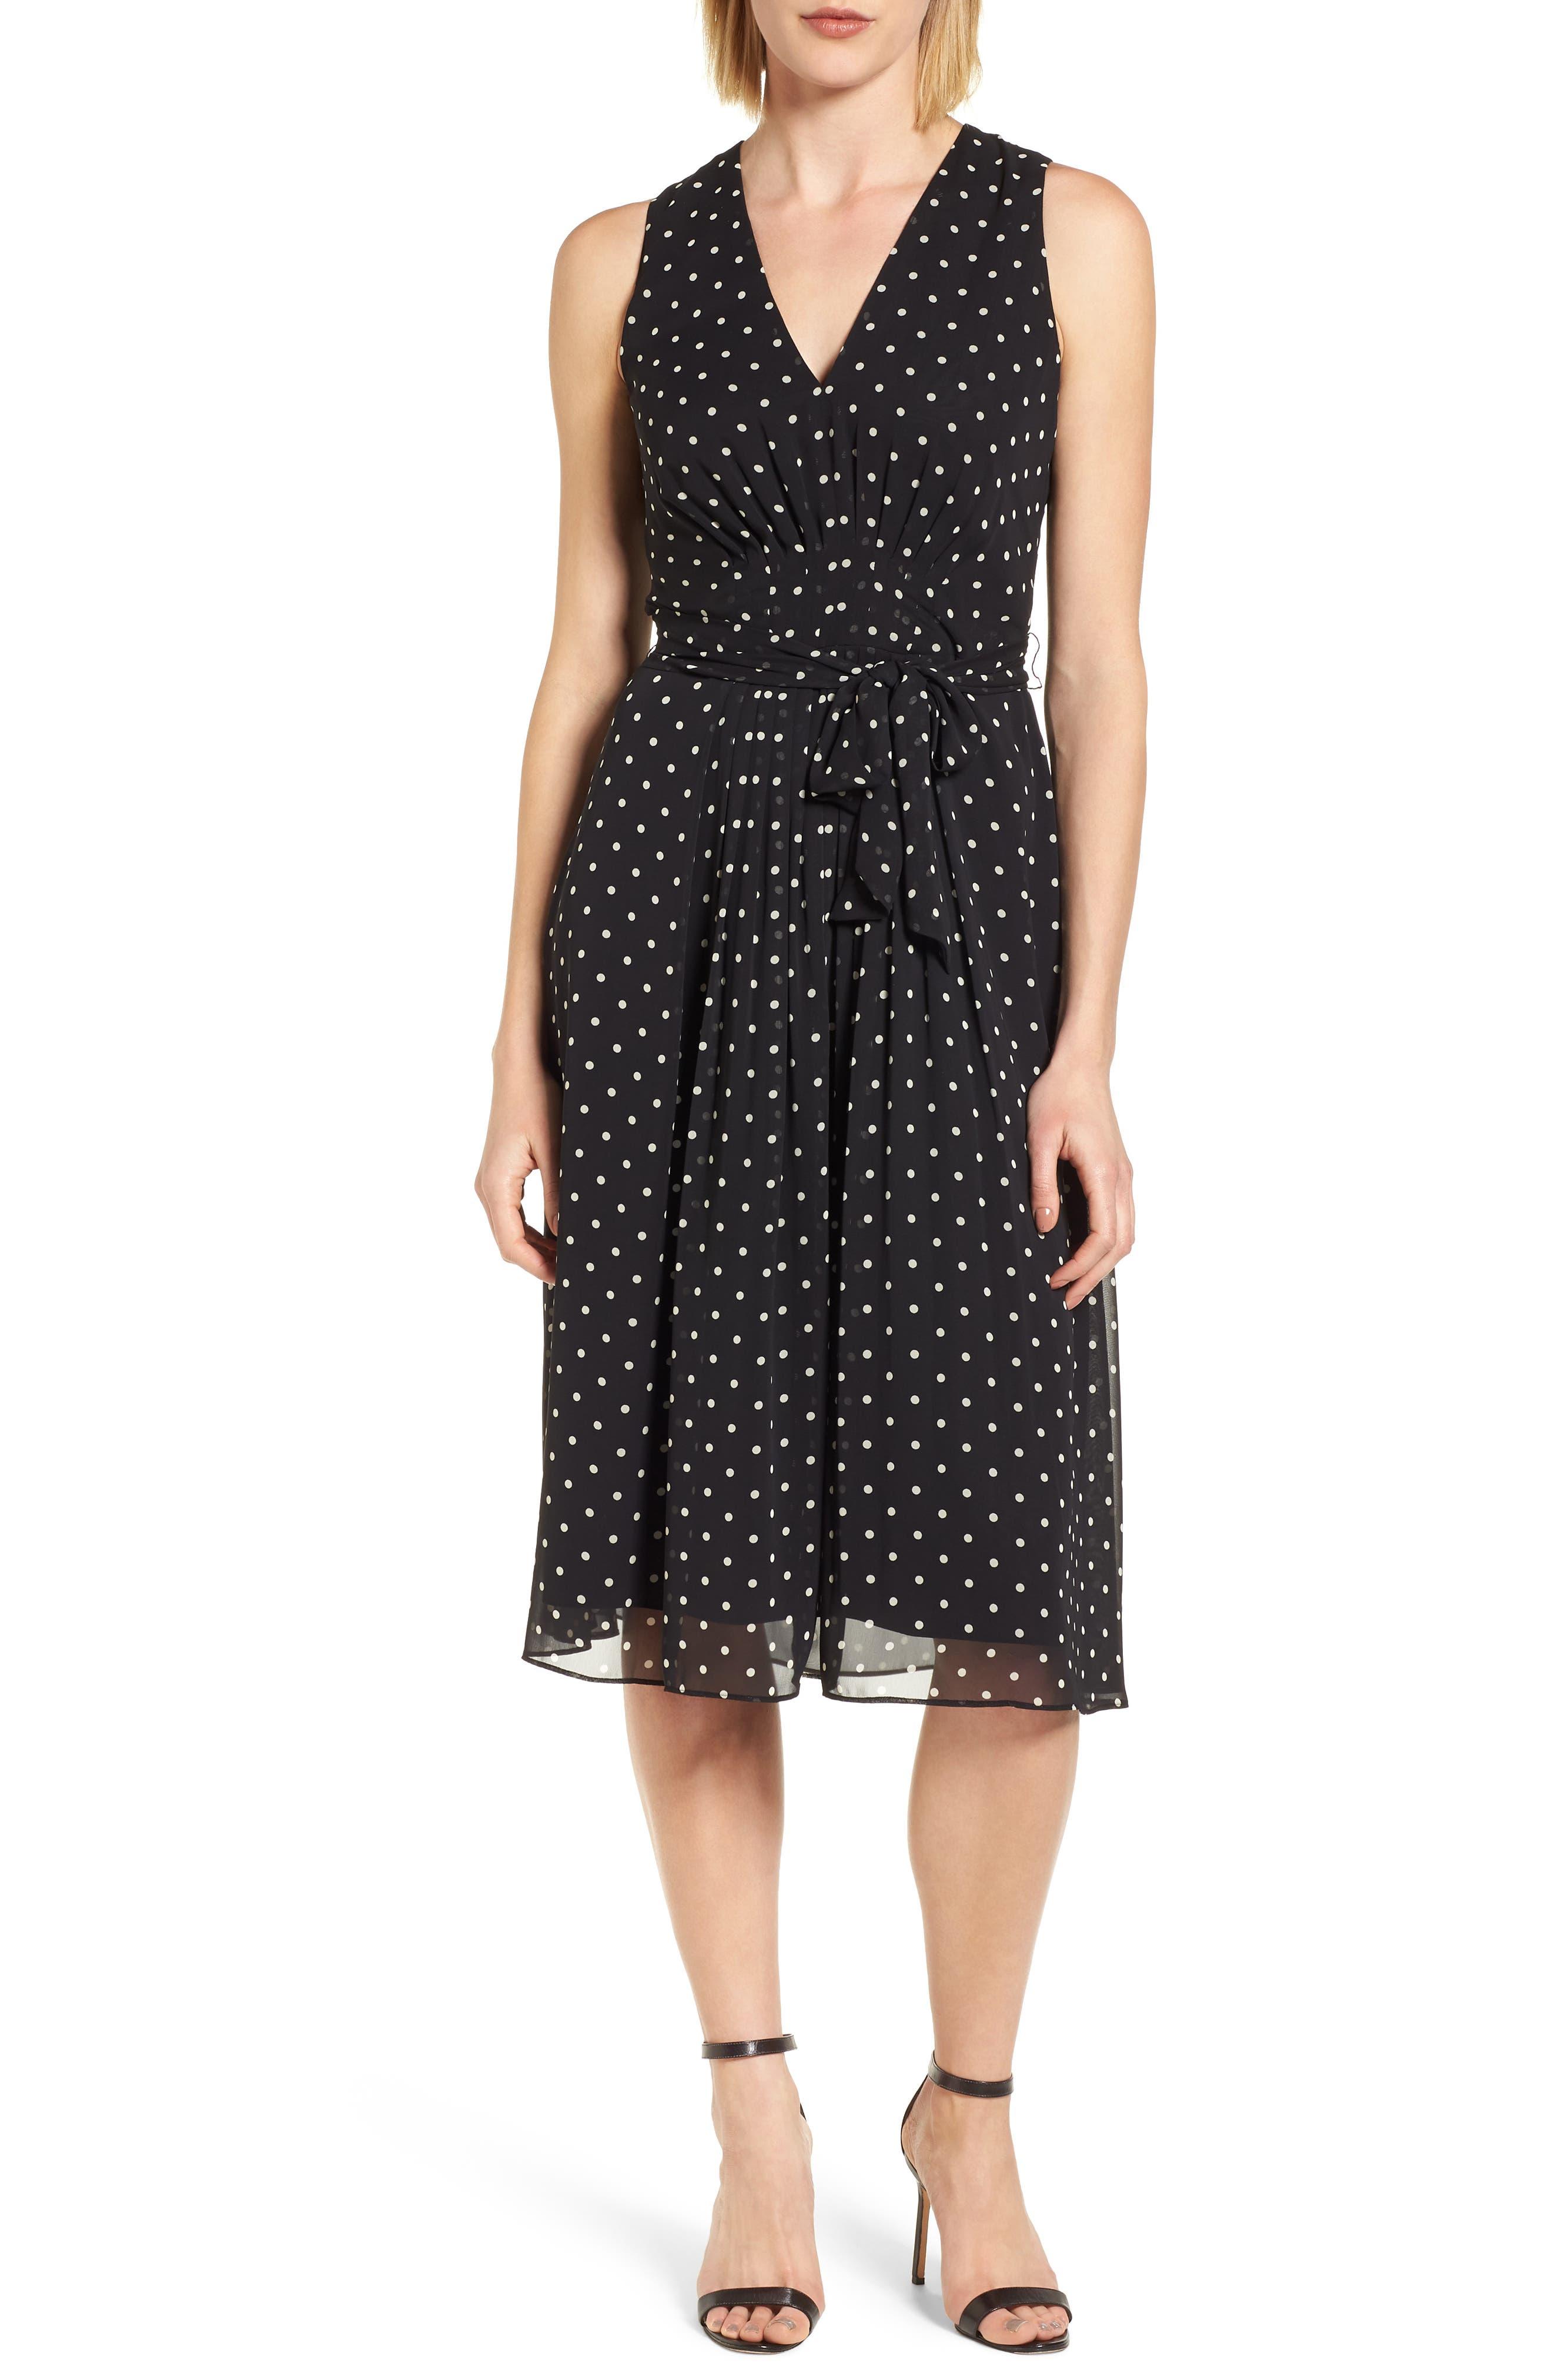 New York Dotted Chiffon Dress,                             Main thumbnail 1, color,                             Black/ White